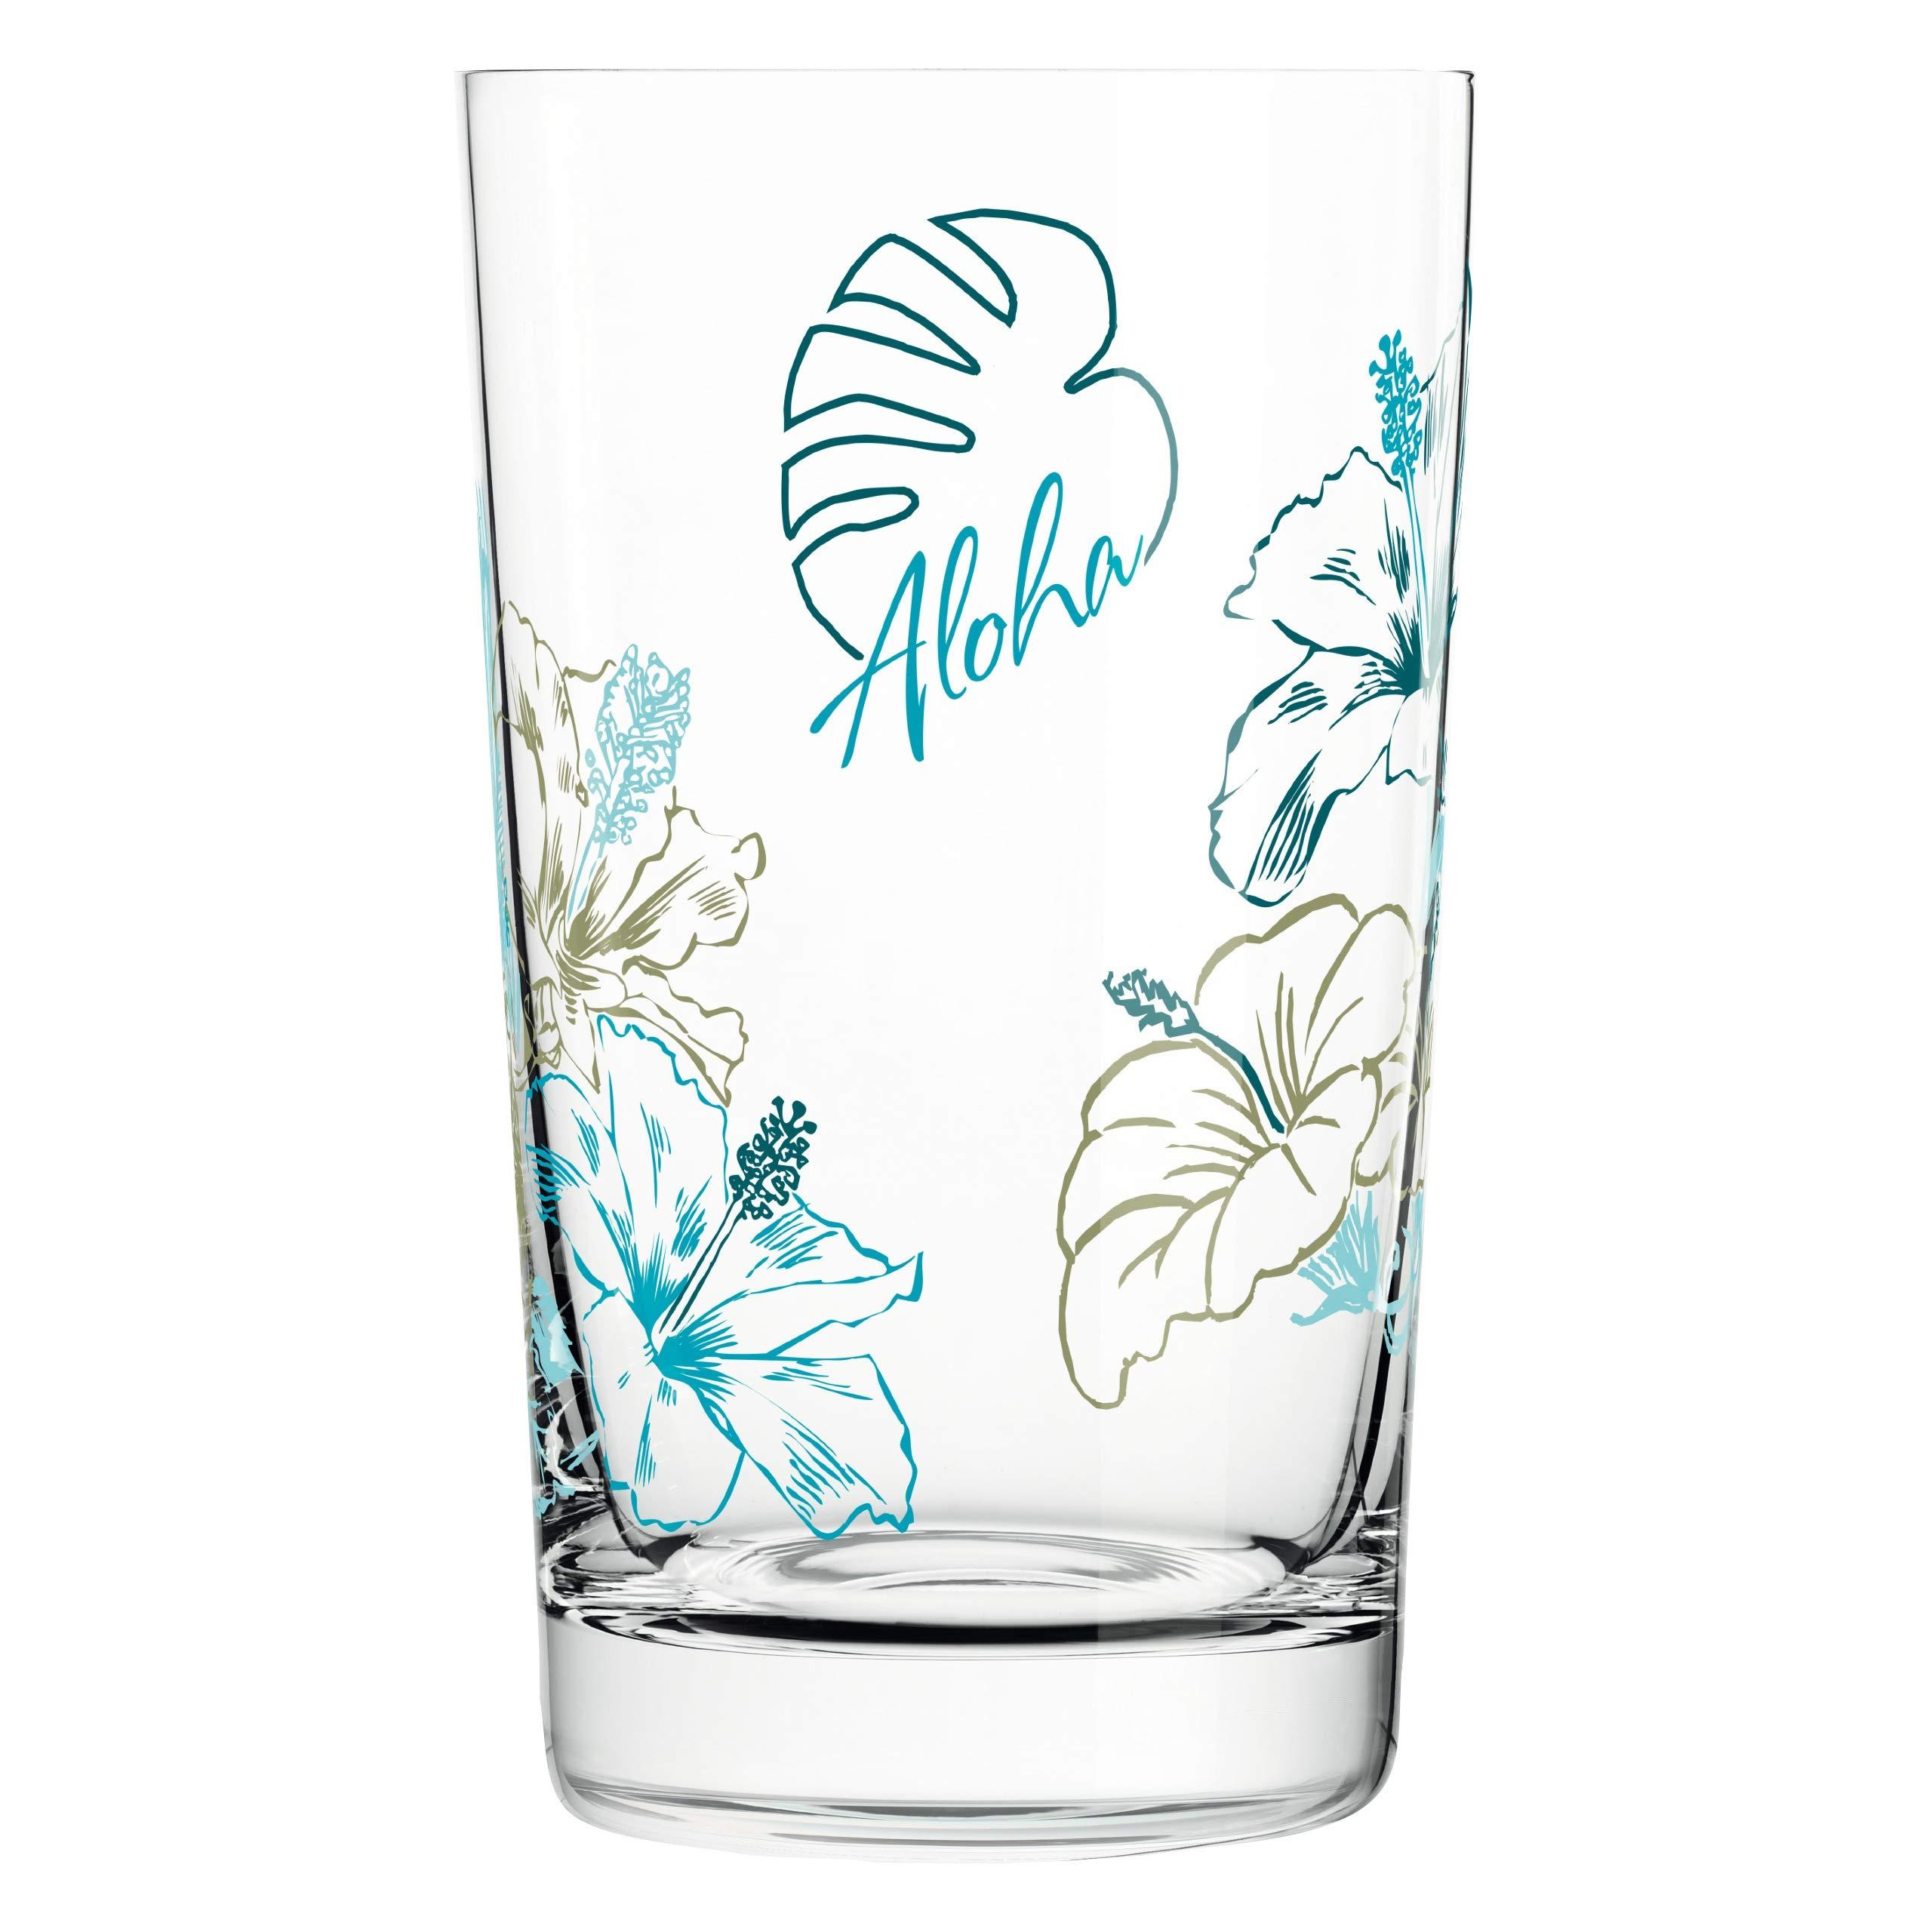 RITZENHOFF Everyday Darling 3270027 Drinking Glass Crystal 300 ml by Ritzenhoff (Image #4)